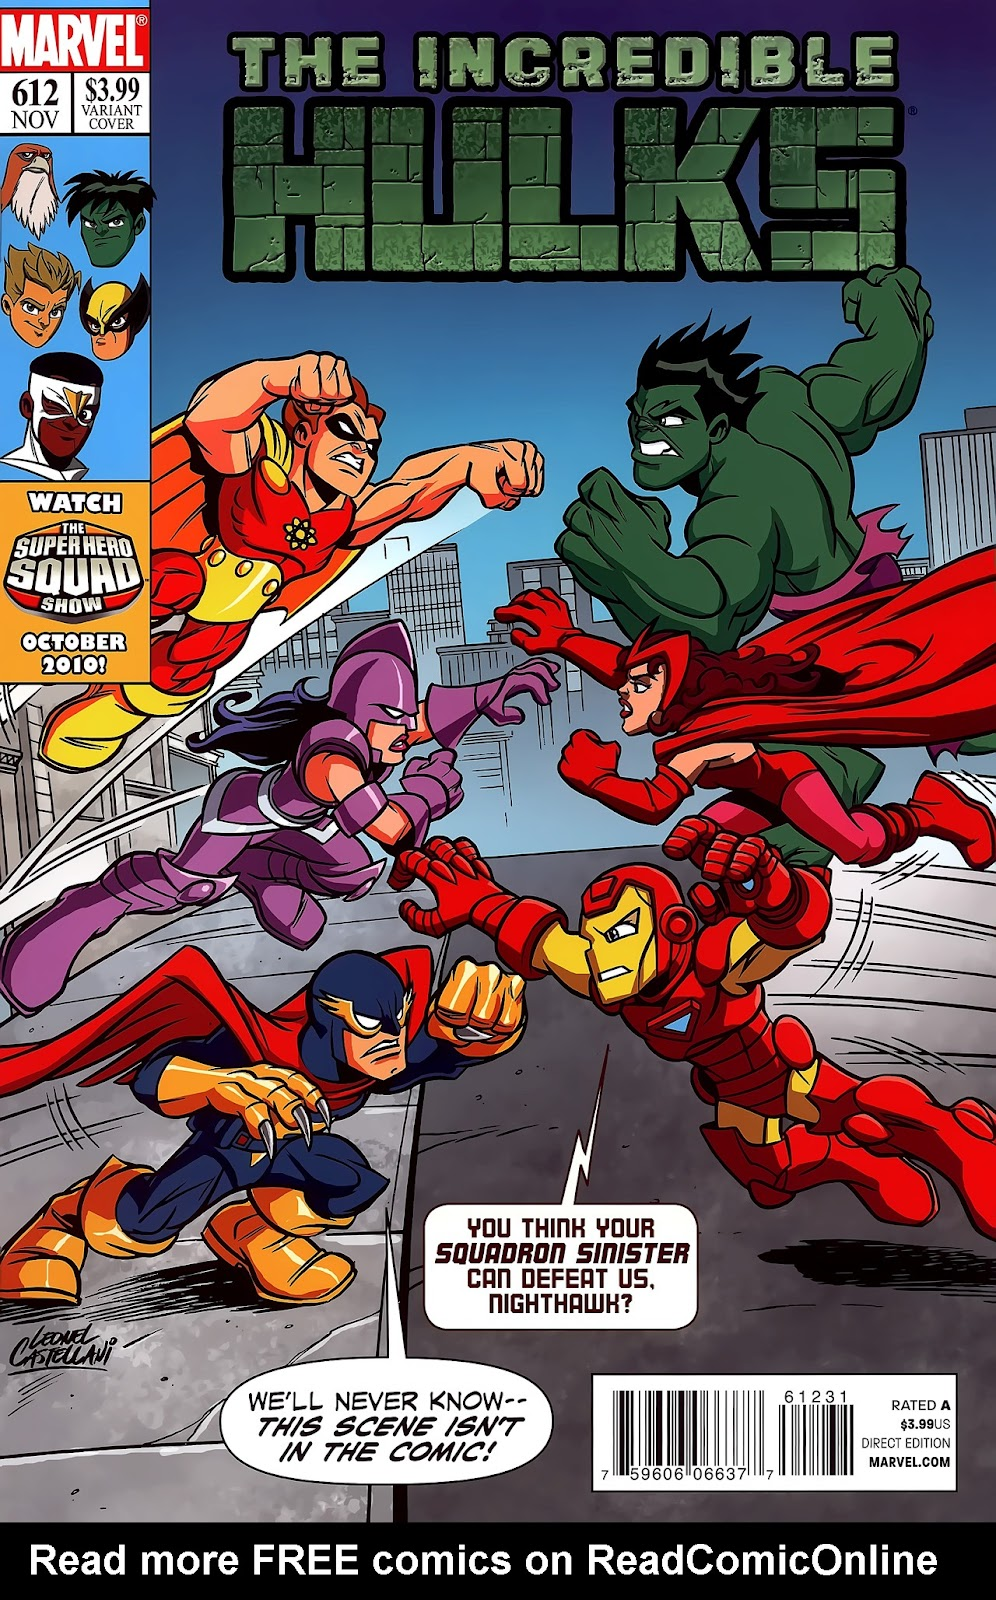 Incredible Hulks (2010) Issue #612 #2 - English 2